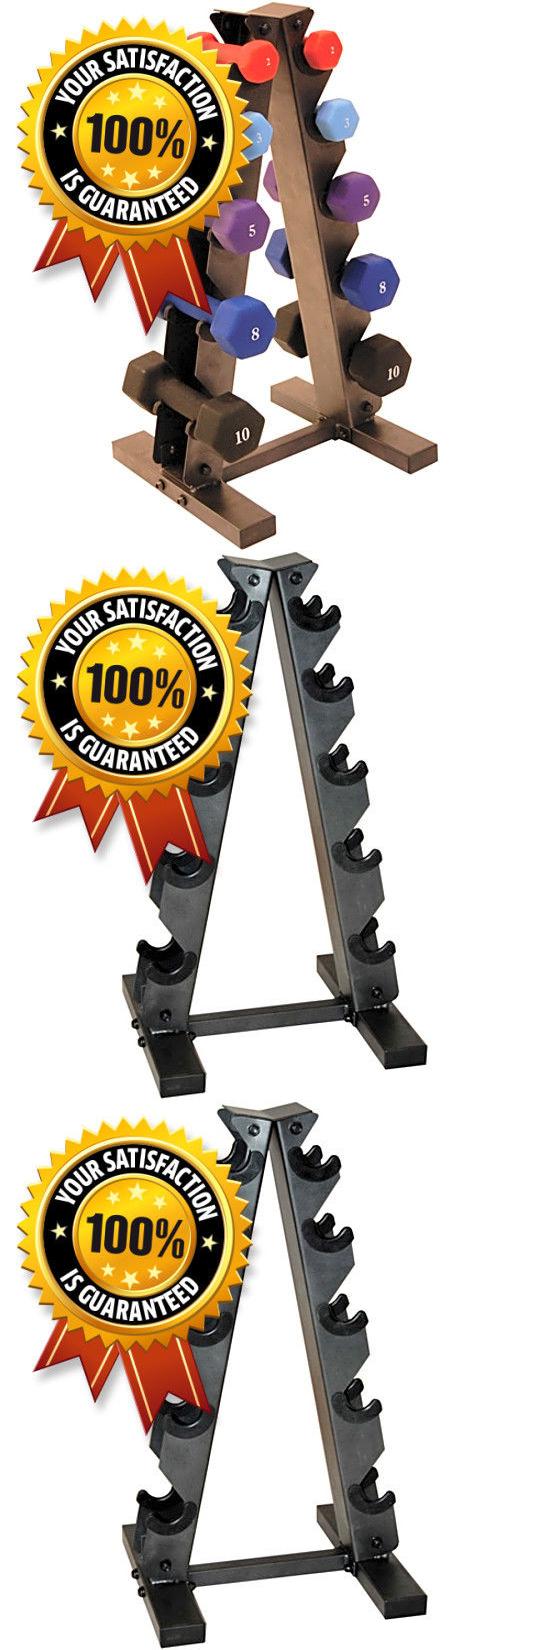 Weight Storage 179819 Cap Barbell A Type Dumbbell Rack Hand Weights Lightweight Holder Workout Dumbel